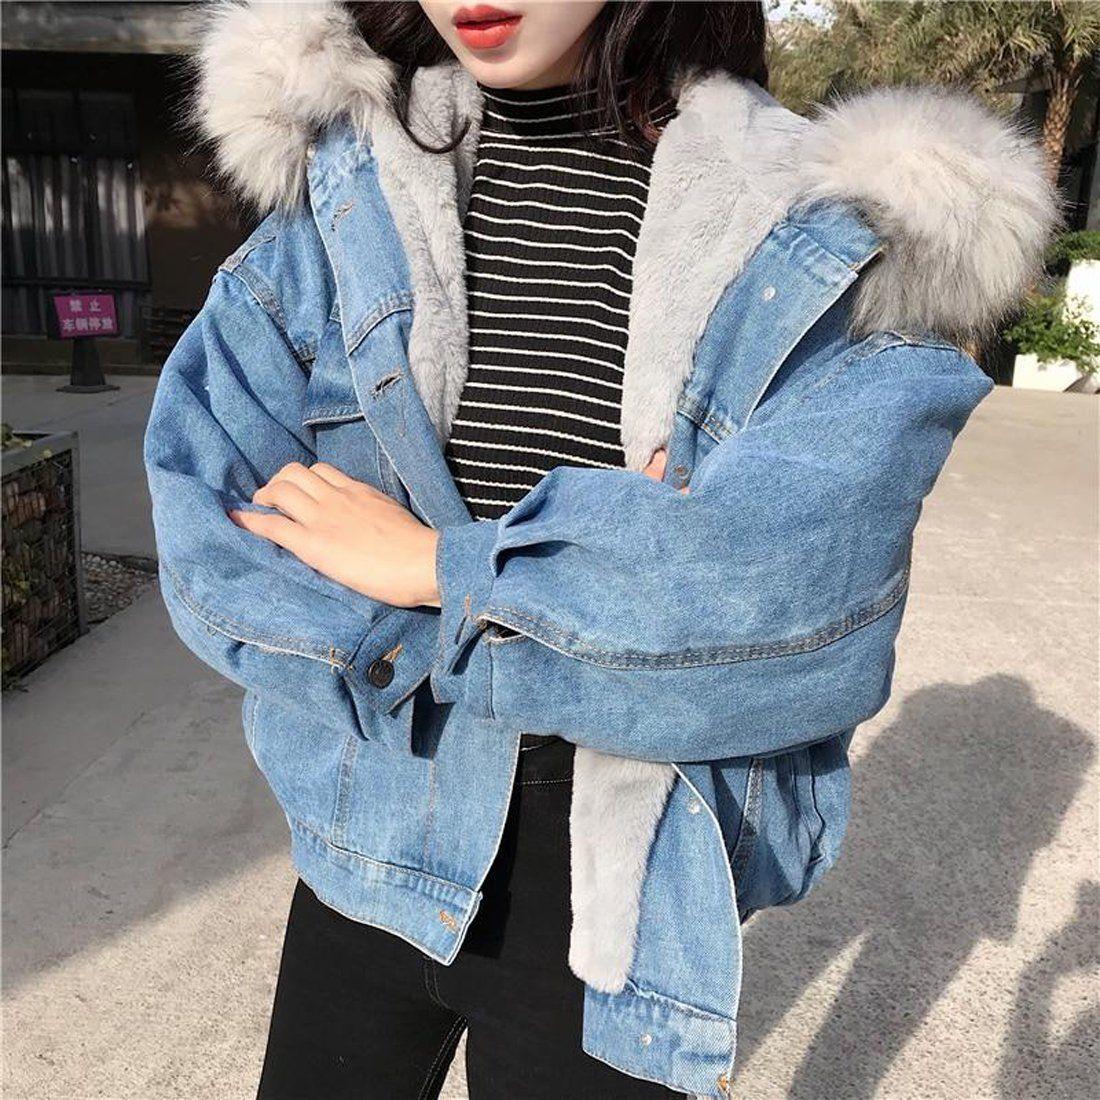 Women S Jean Jacket Big Faux Fur Collar Oversized Batwing Sleeve Denim Wool Liner Velvet Warm Hooded For Winter Jackets For Women Winter Jackets Women Denim Jacket With Fur [ 1100 x 1100 Pixel ]